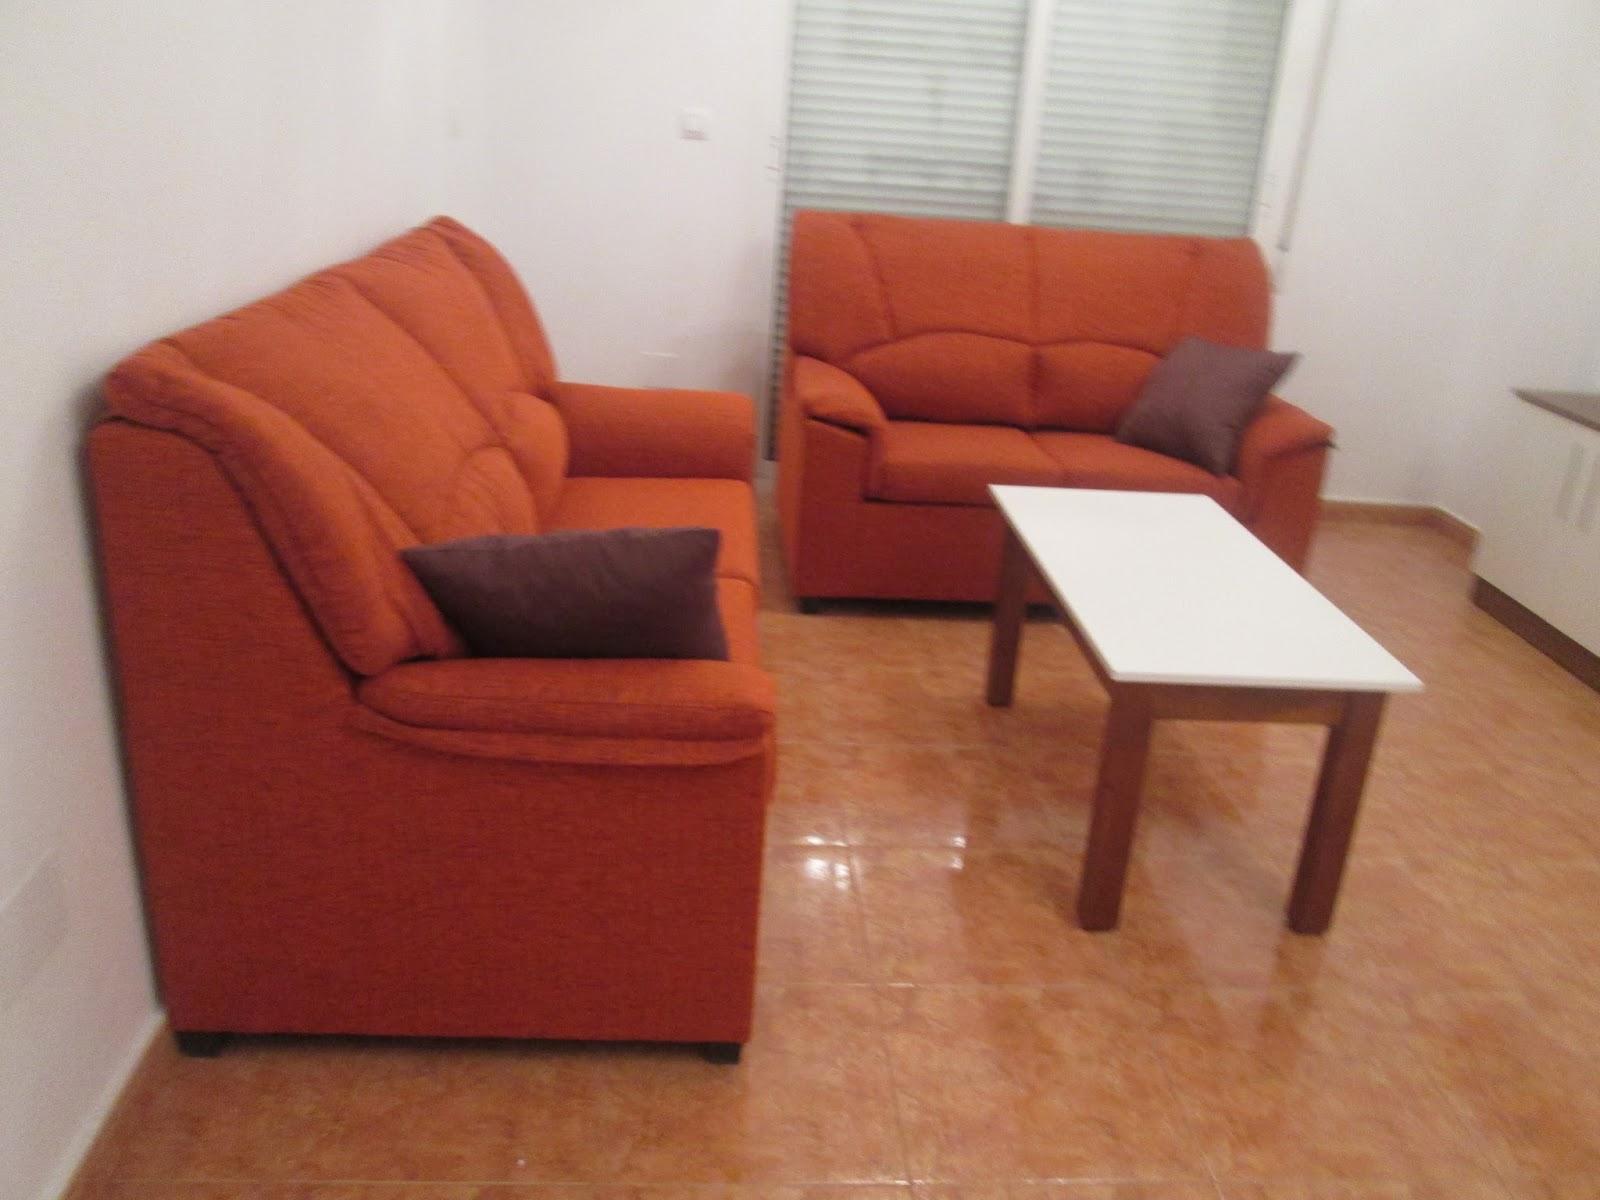 Muebles arcecoll amuebla tu piso por muy poco - Amuebla tu piso completo barato ...